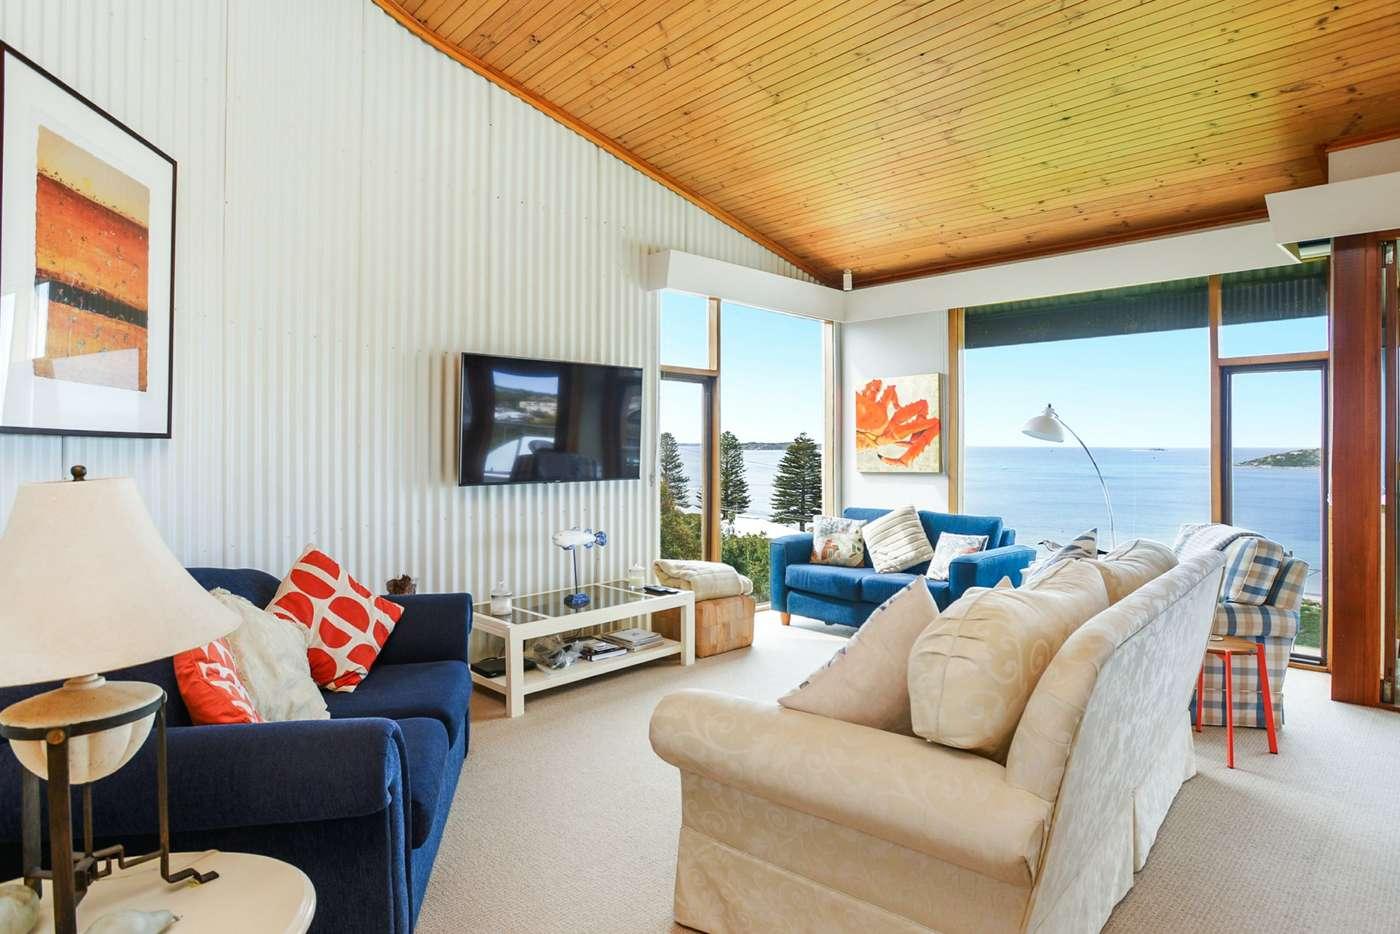 Seventh view of Homely house listing, 7 Battye Rd, Encounter Bay SA 5211